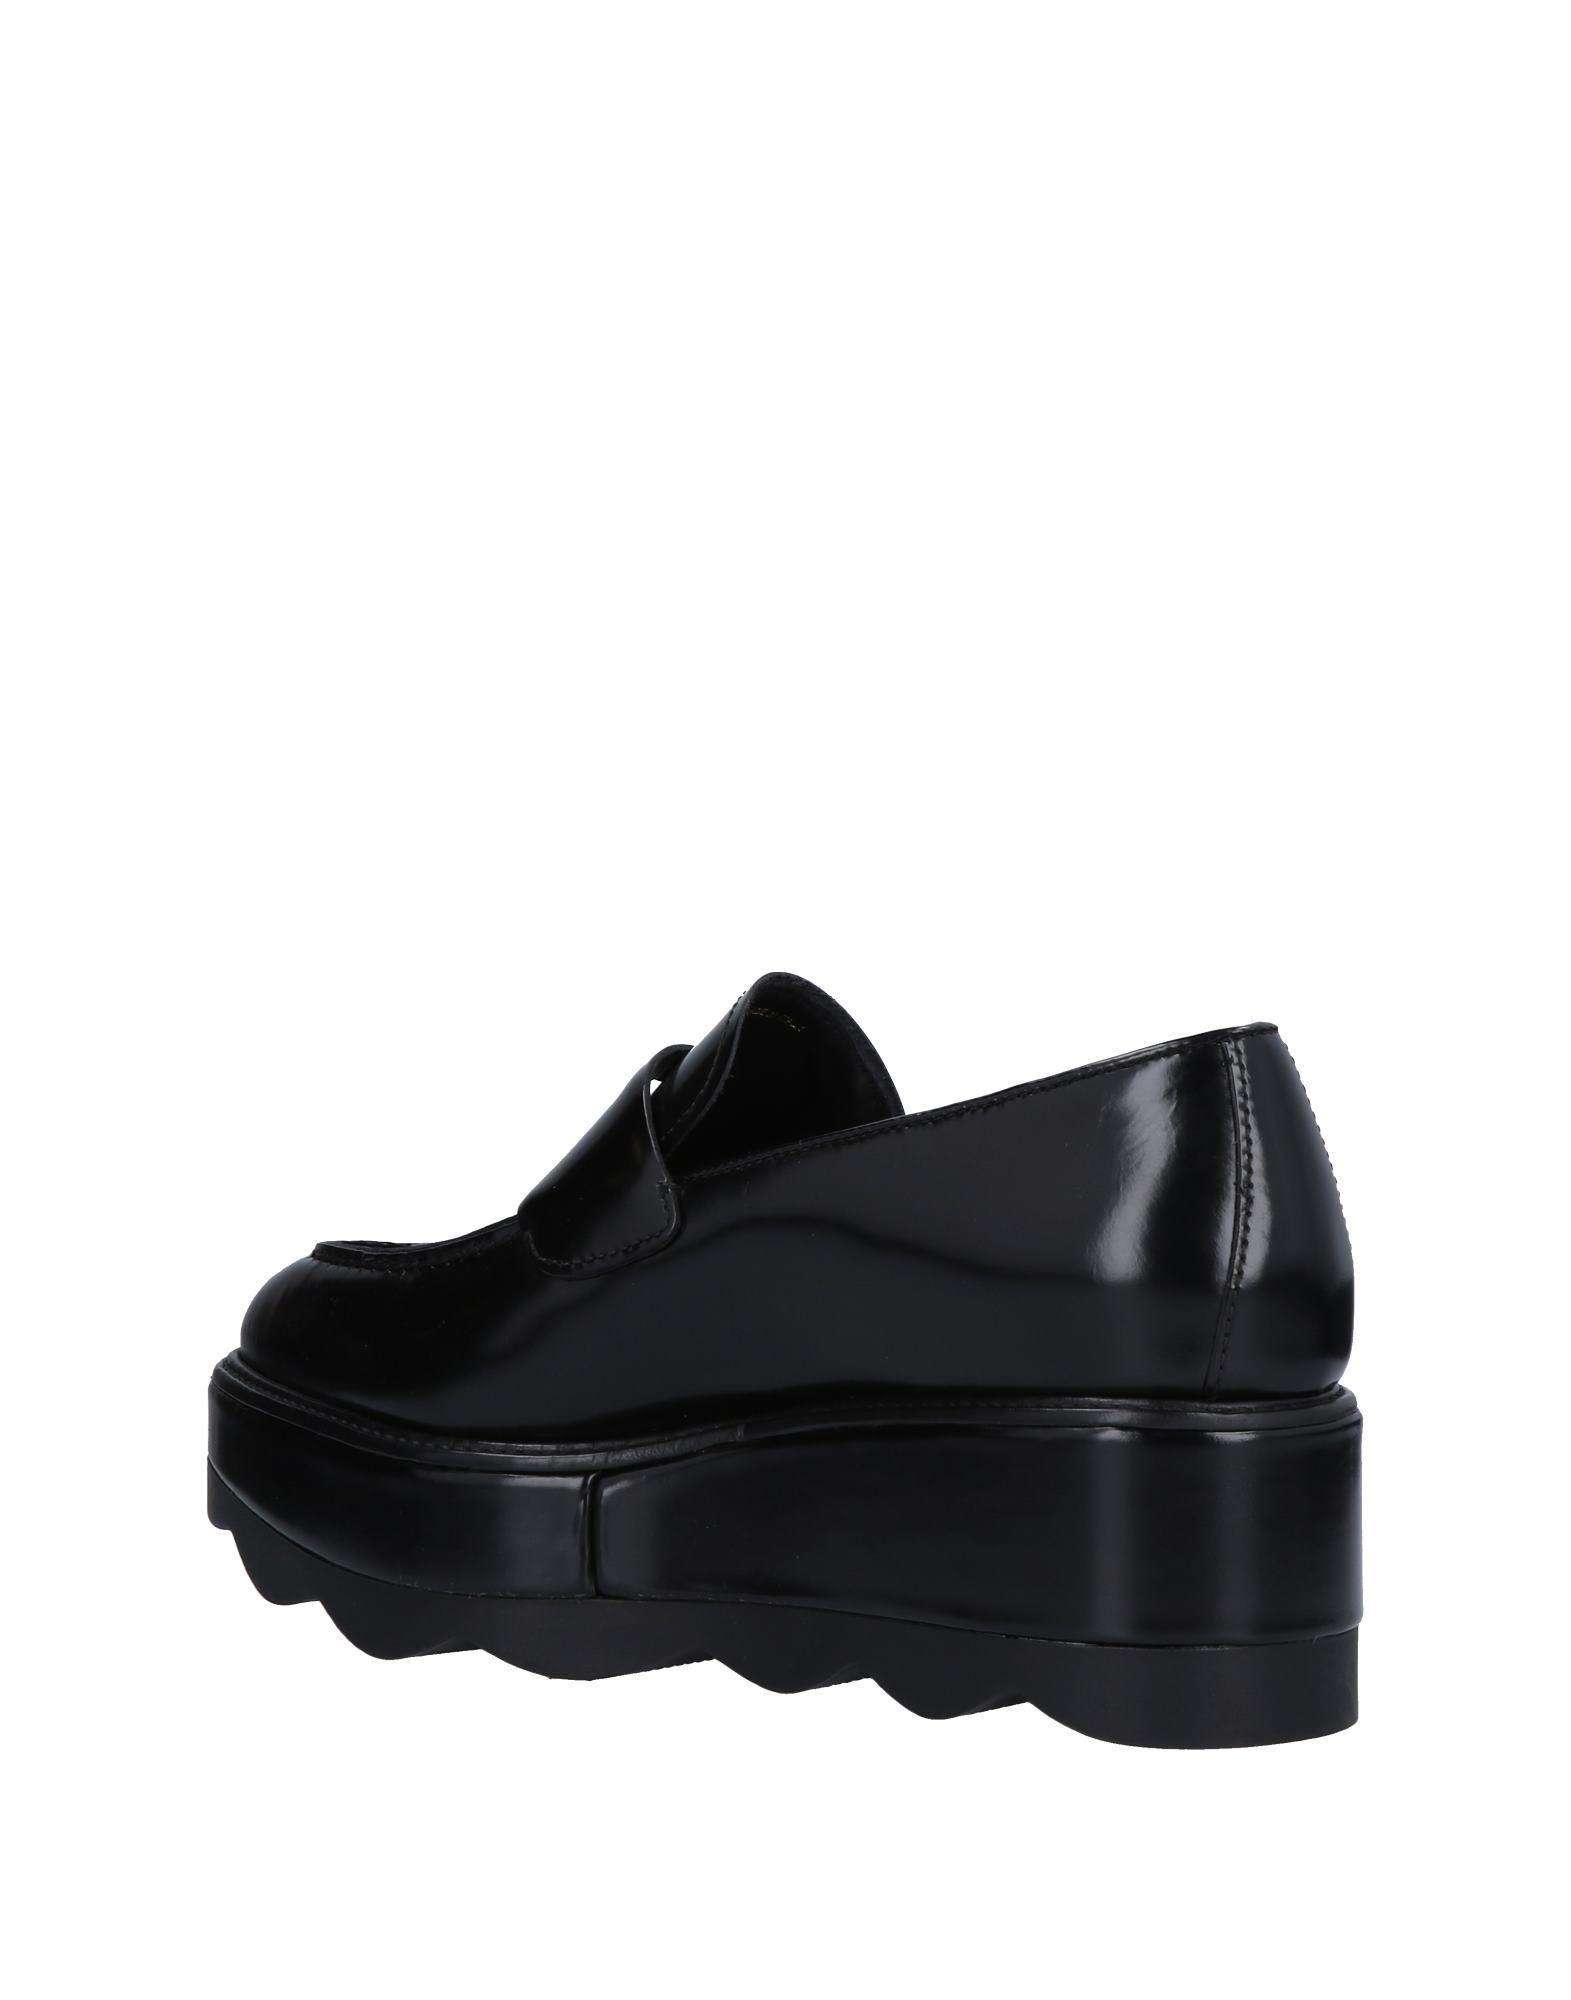 Prada Mokassins Damen Schuhe  11503213WCGünstige gut aussehende Schuhe Damen 8c06cc